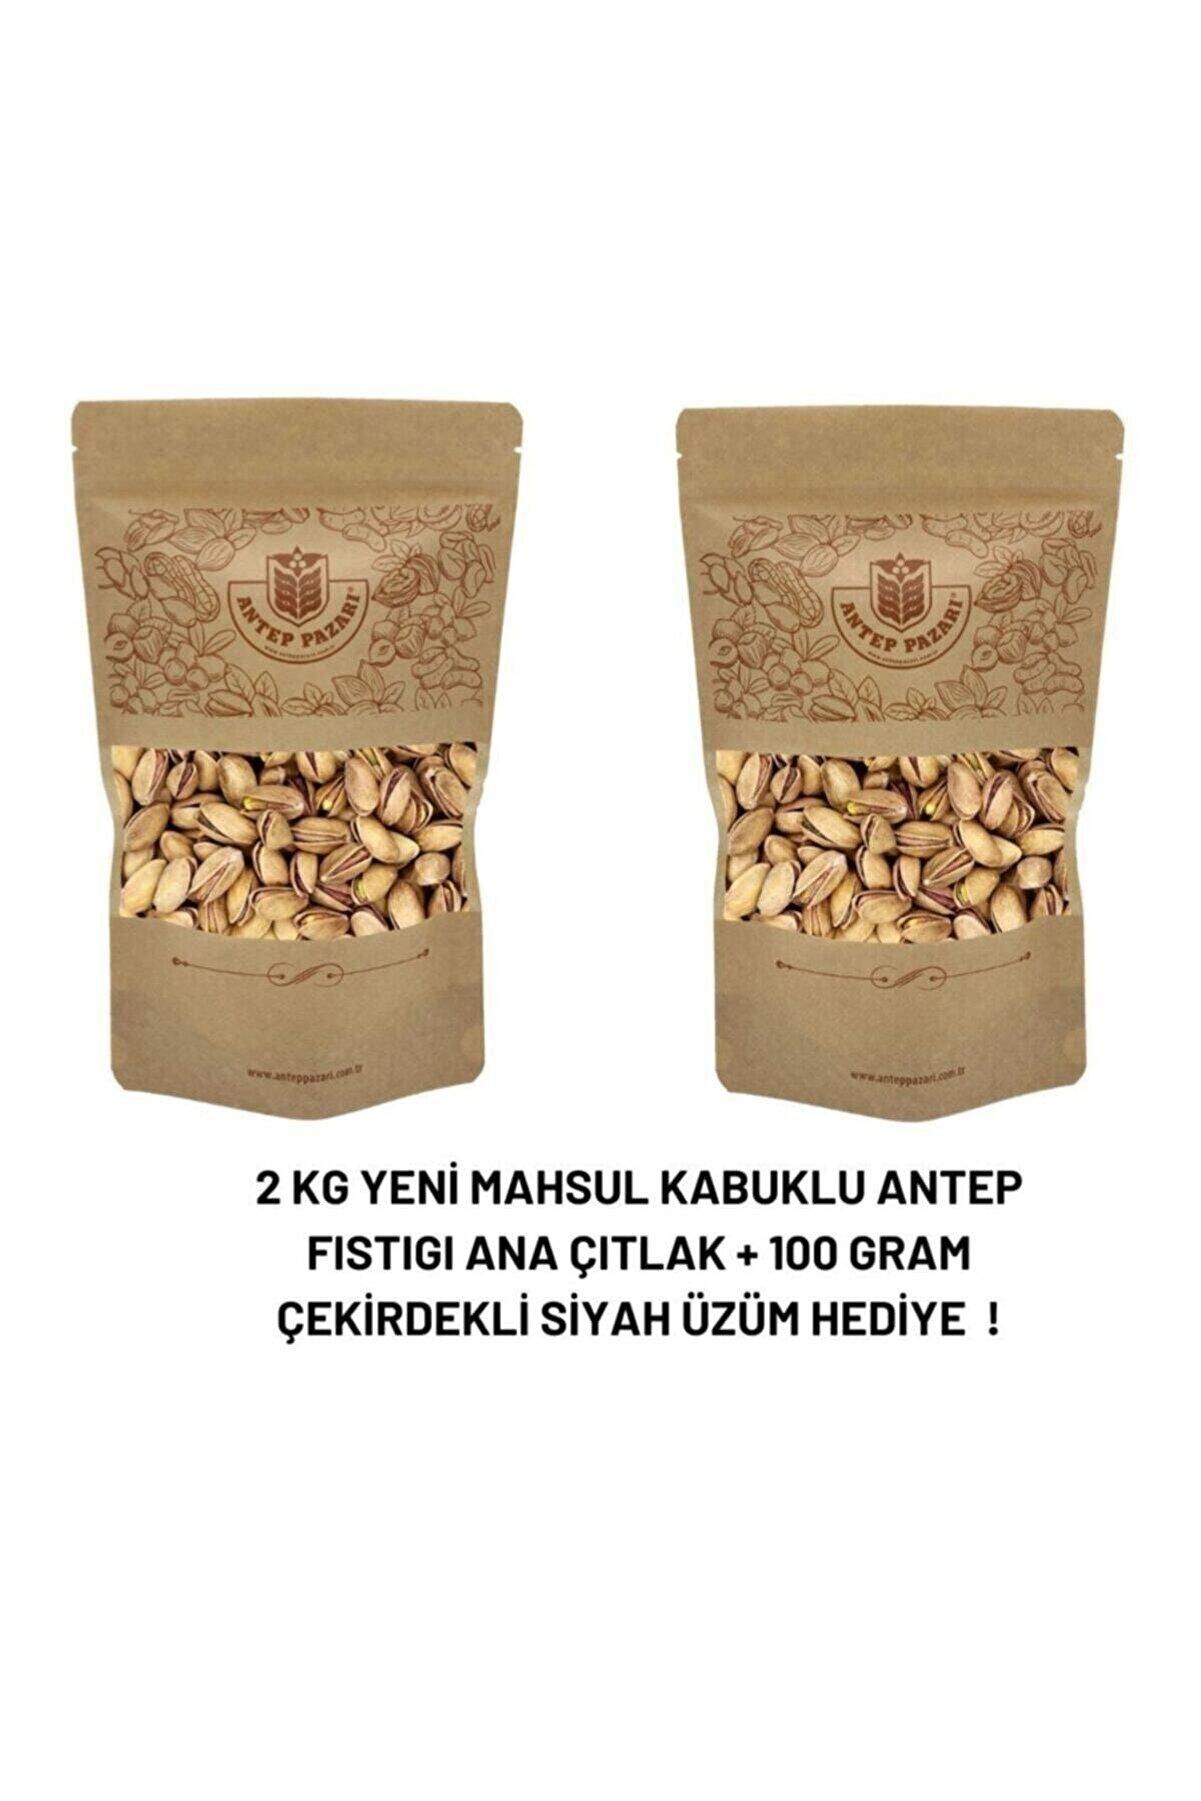 Antep Pazarı Antep Fıstıgı Yeni Mahsul Kavrulmuş Özel 2li Paket 2000 gram